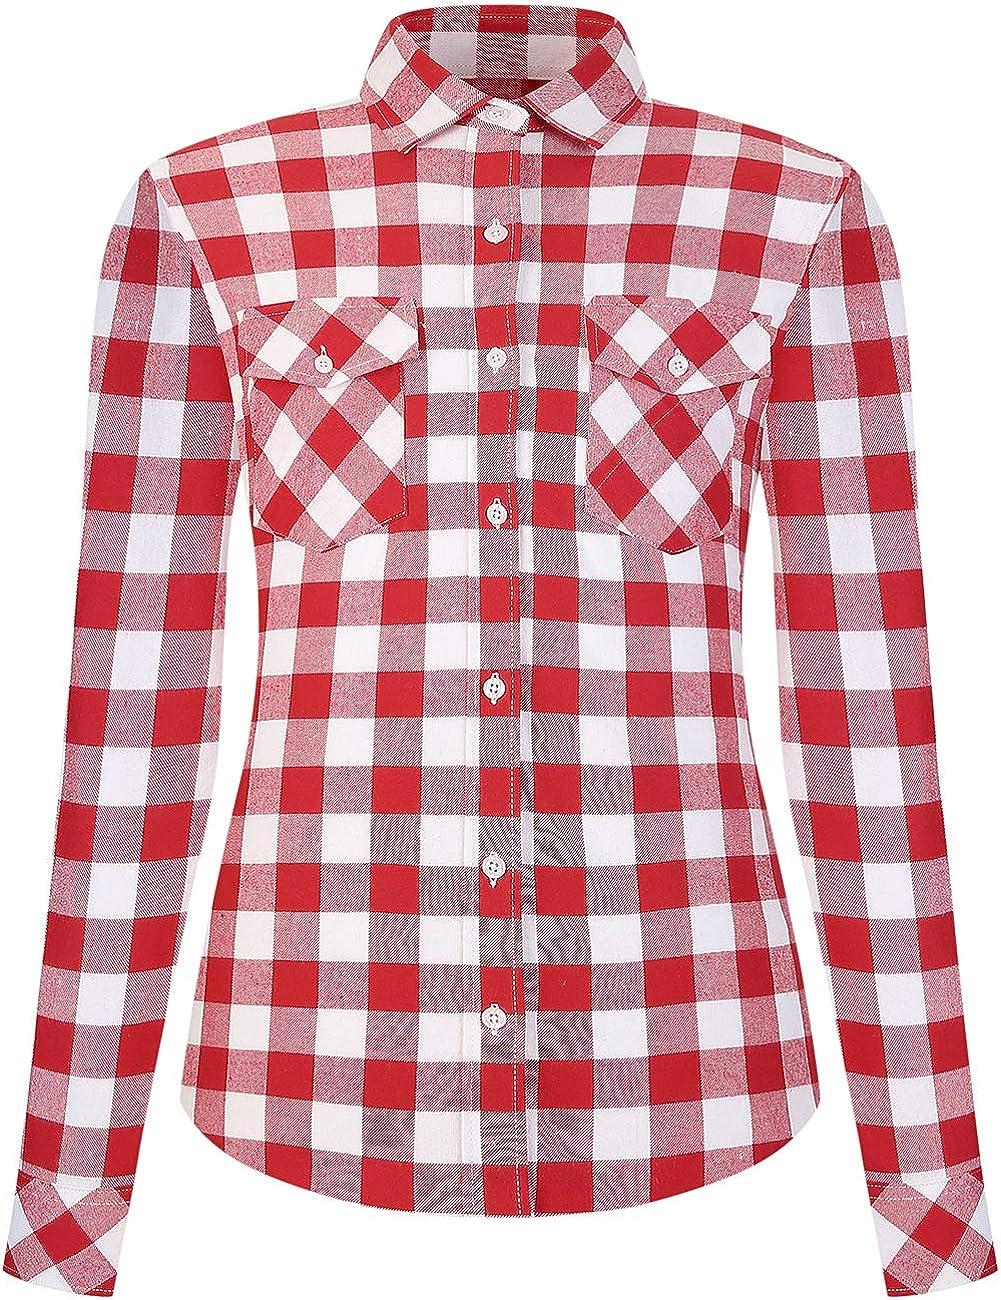 DOKKIA Women's Flannel Shirt Casual Tops Long Sleeve Buffalo Plaid Check Blouses Jacket